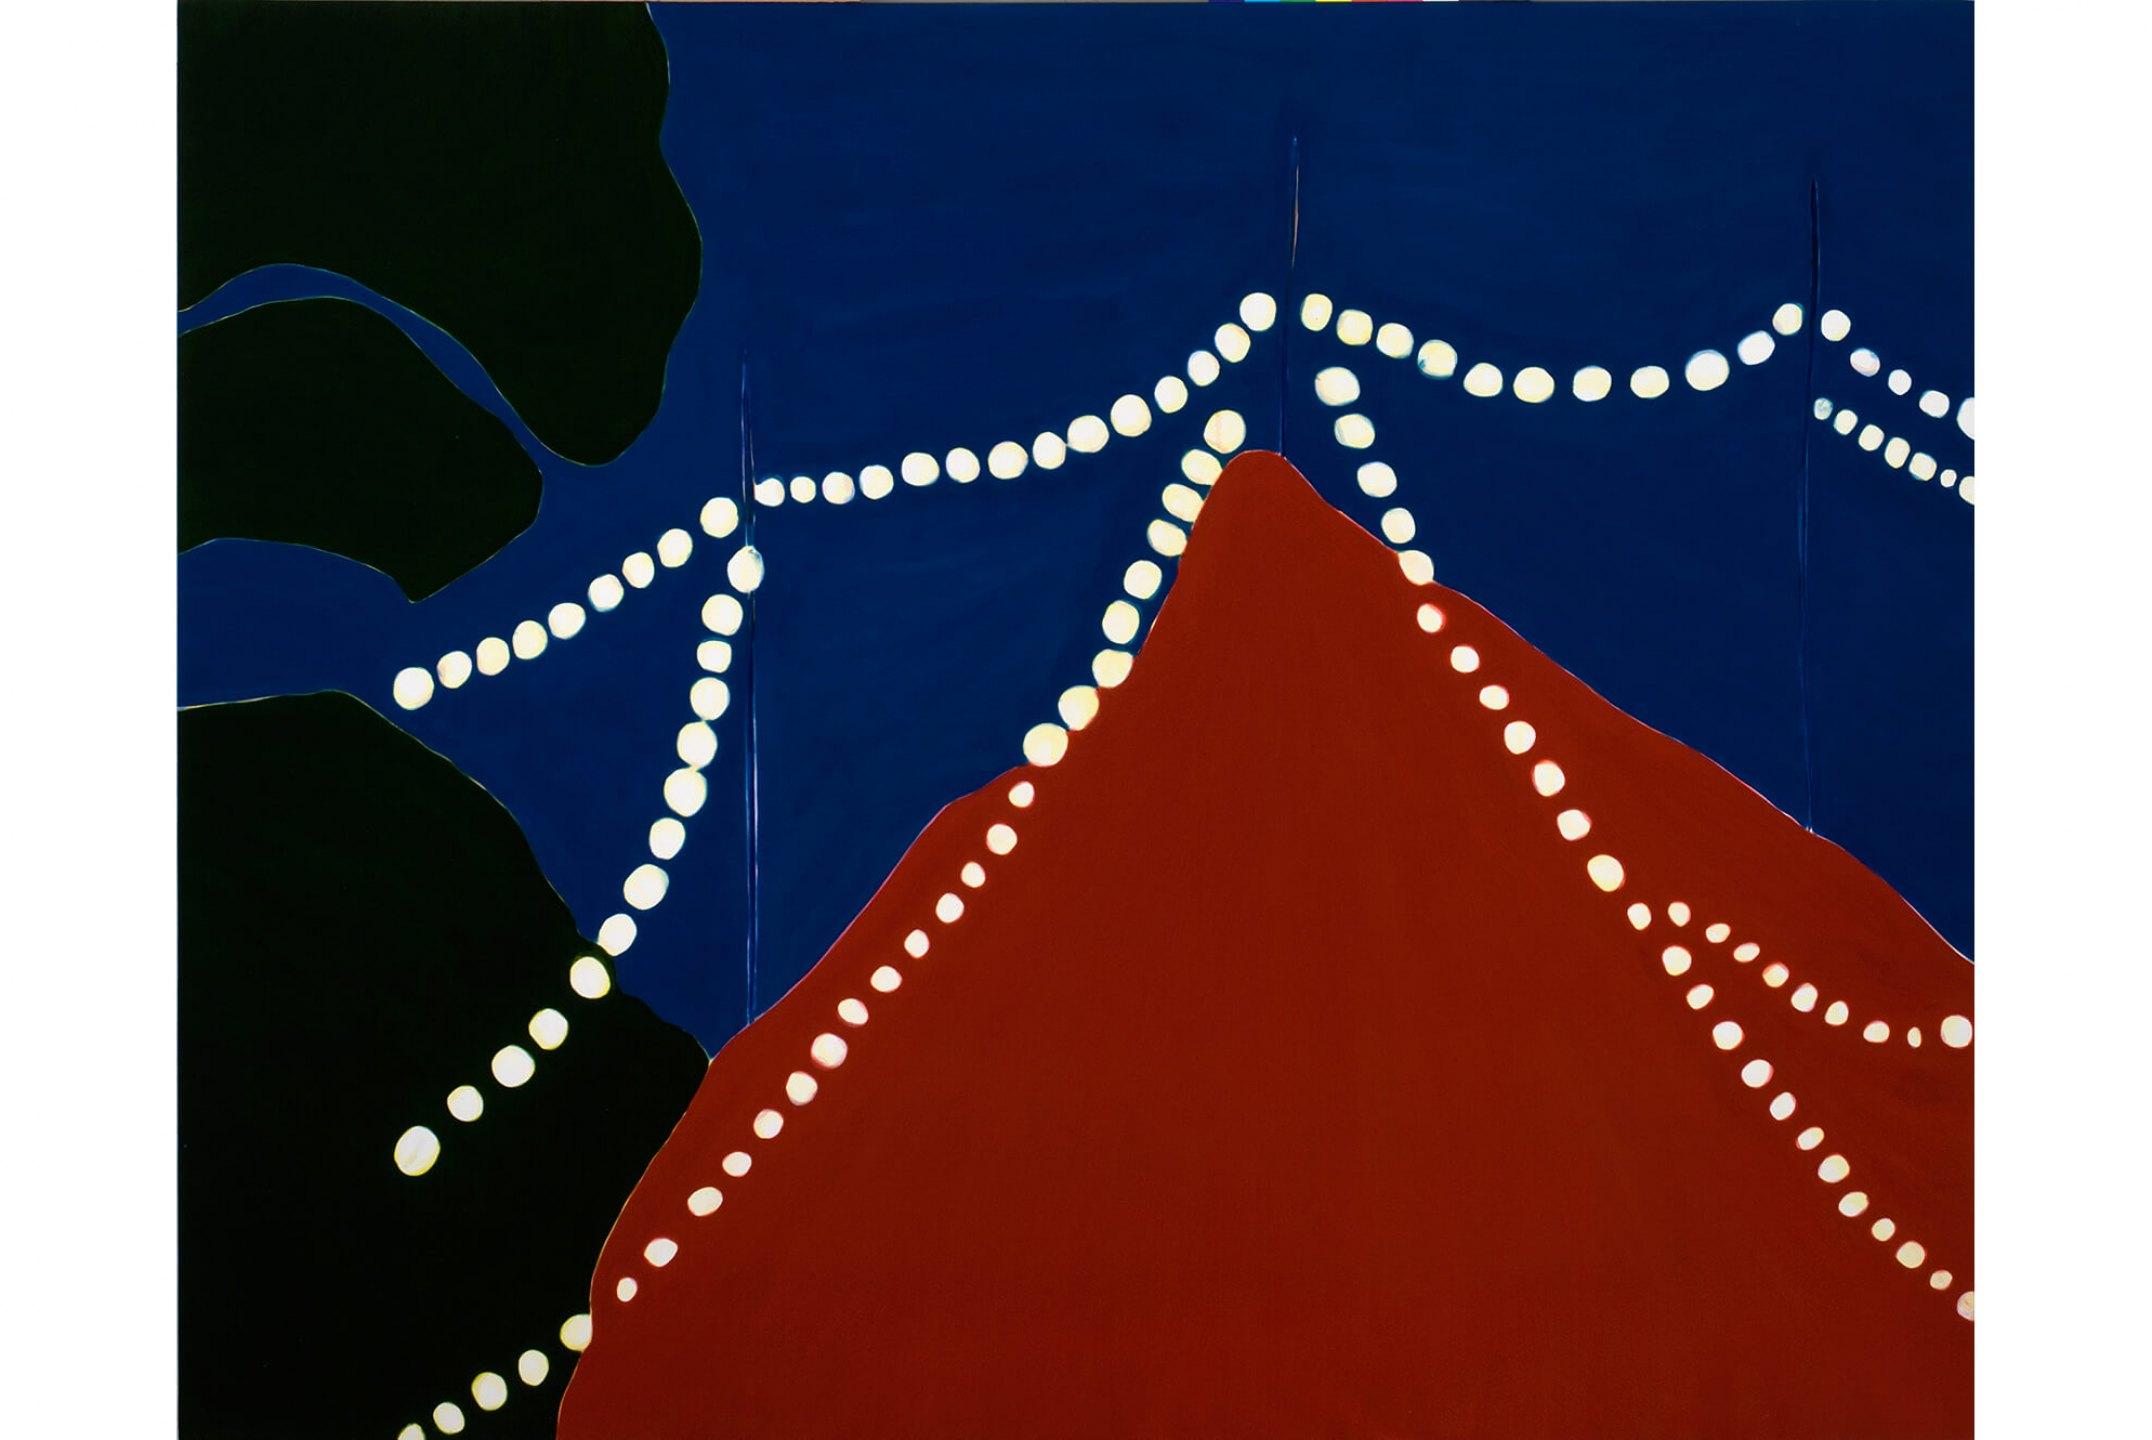 Patricia Leite, <em>Untitled (Lamp Bulbs III)</em>,&nbsp;2009, oil on wood, 180&nbsp;×&nbsp;200 cm - Mendes Wood DM